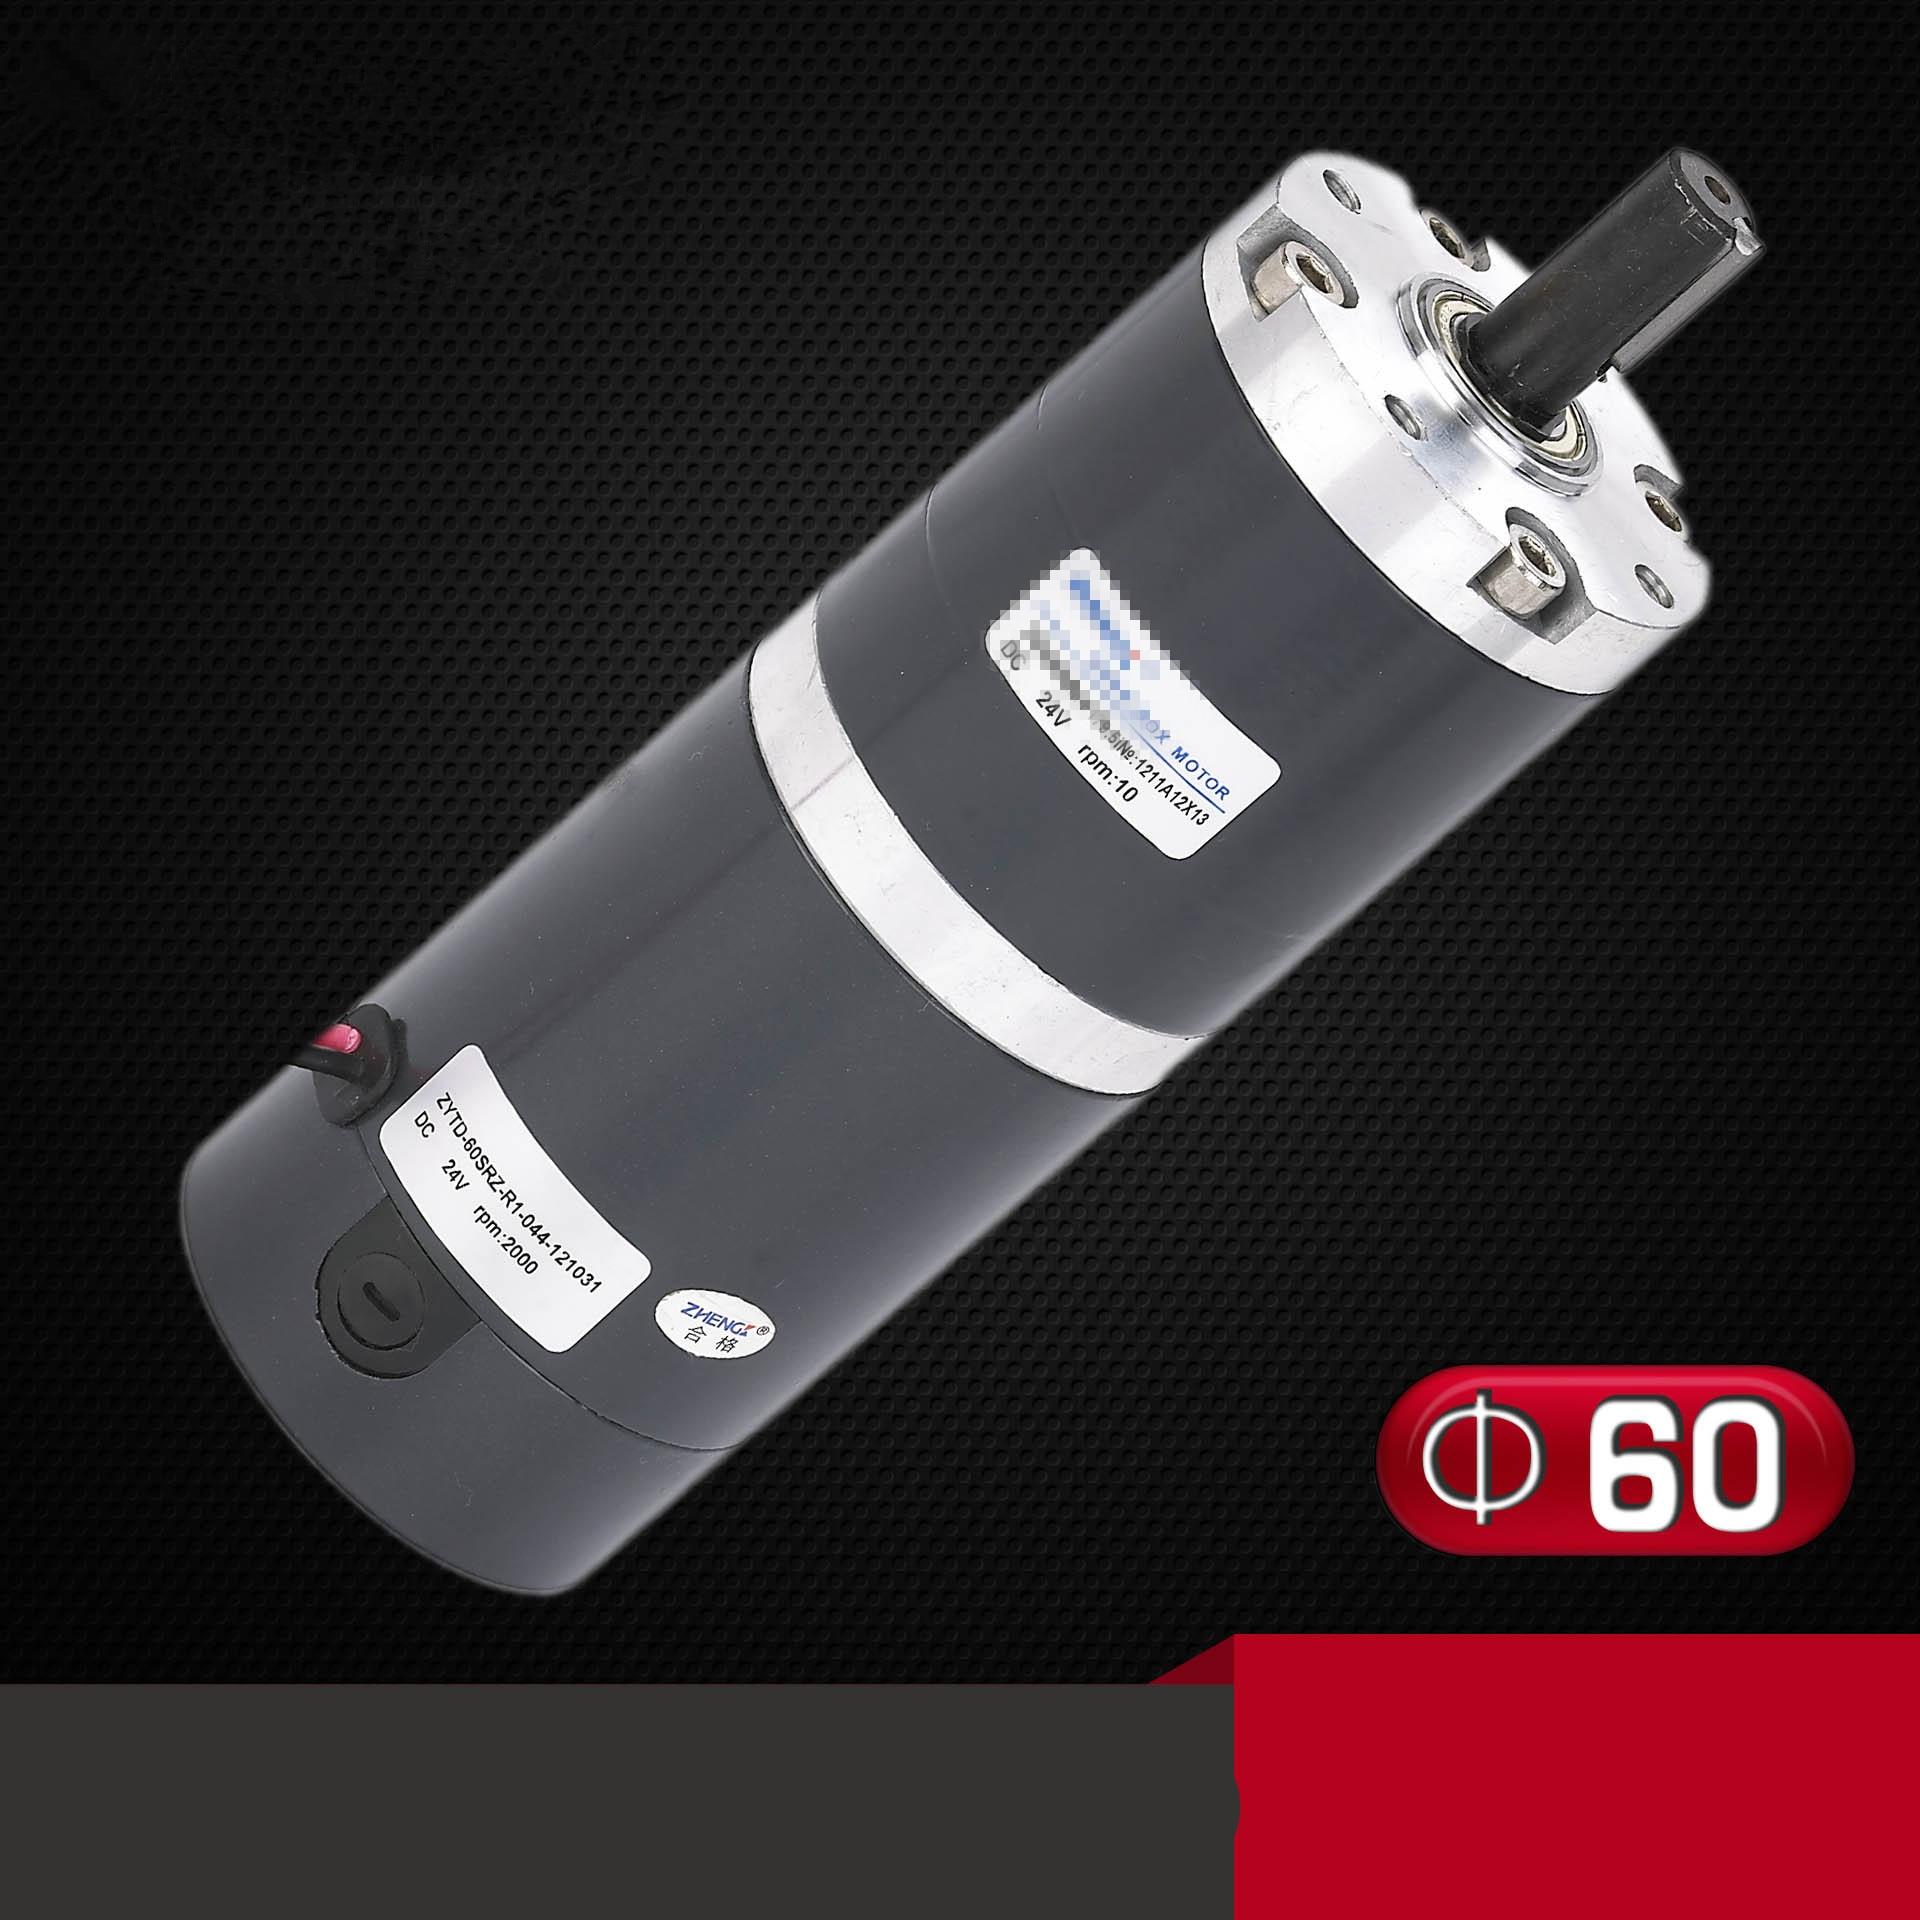 ZGX60RMM DC 12V 24V 12mm 60mm Shaft Permanent Magnet Planetary Gear Motor Brush 5RPM-570RPM panasonic es 3042